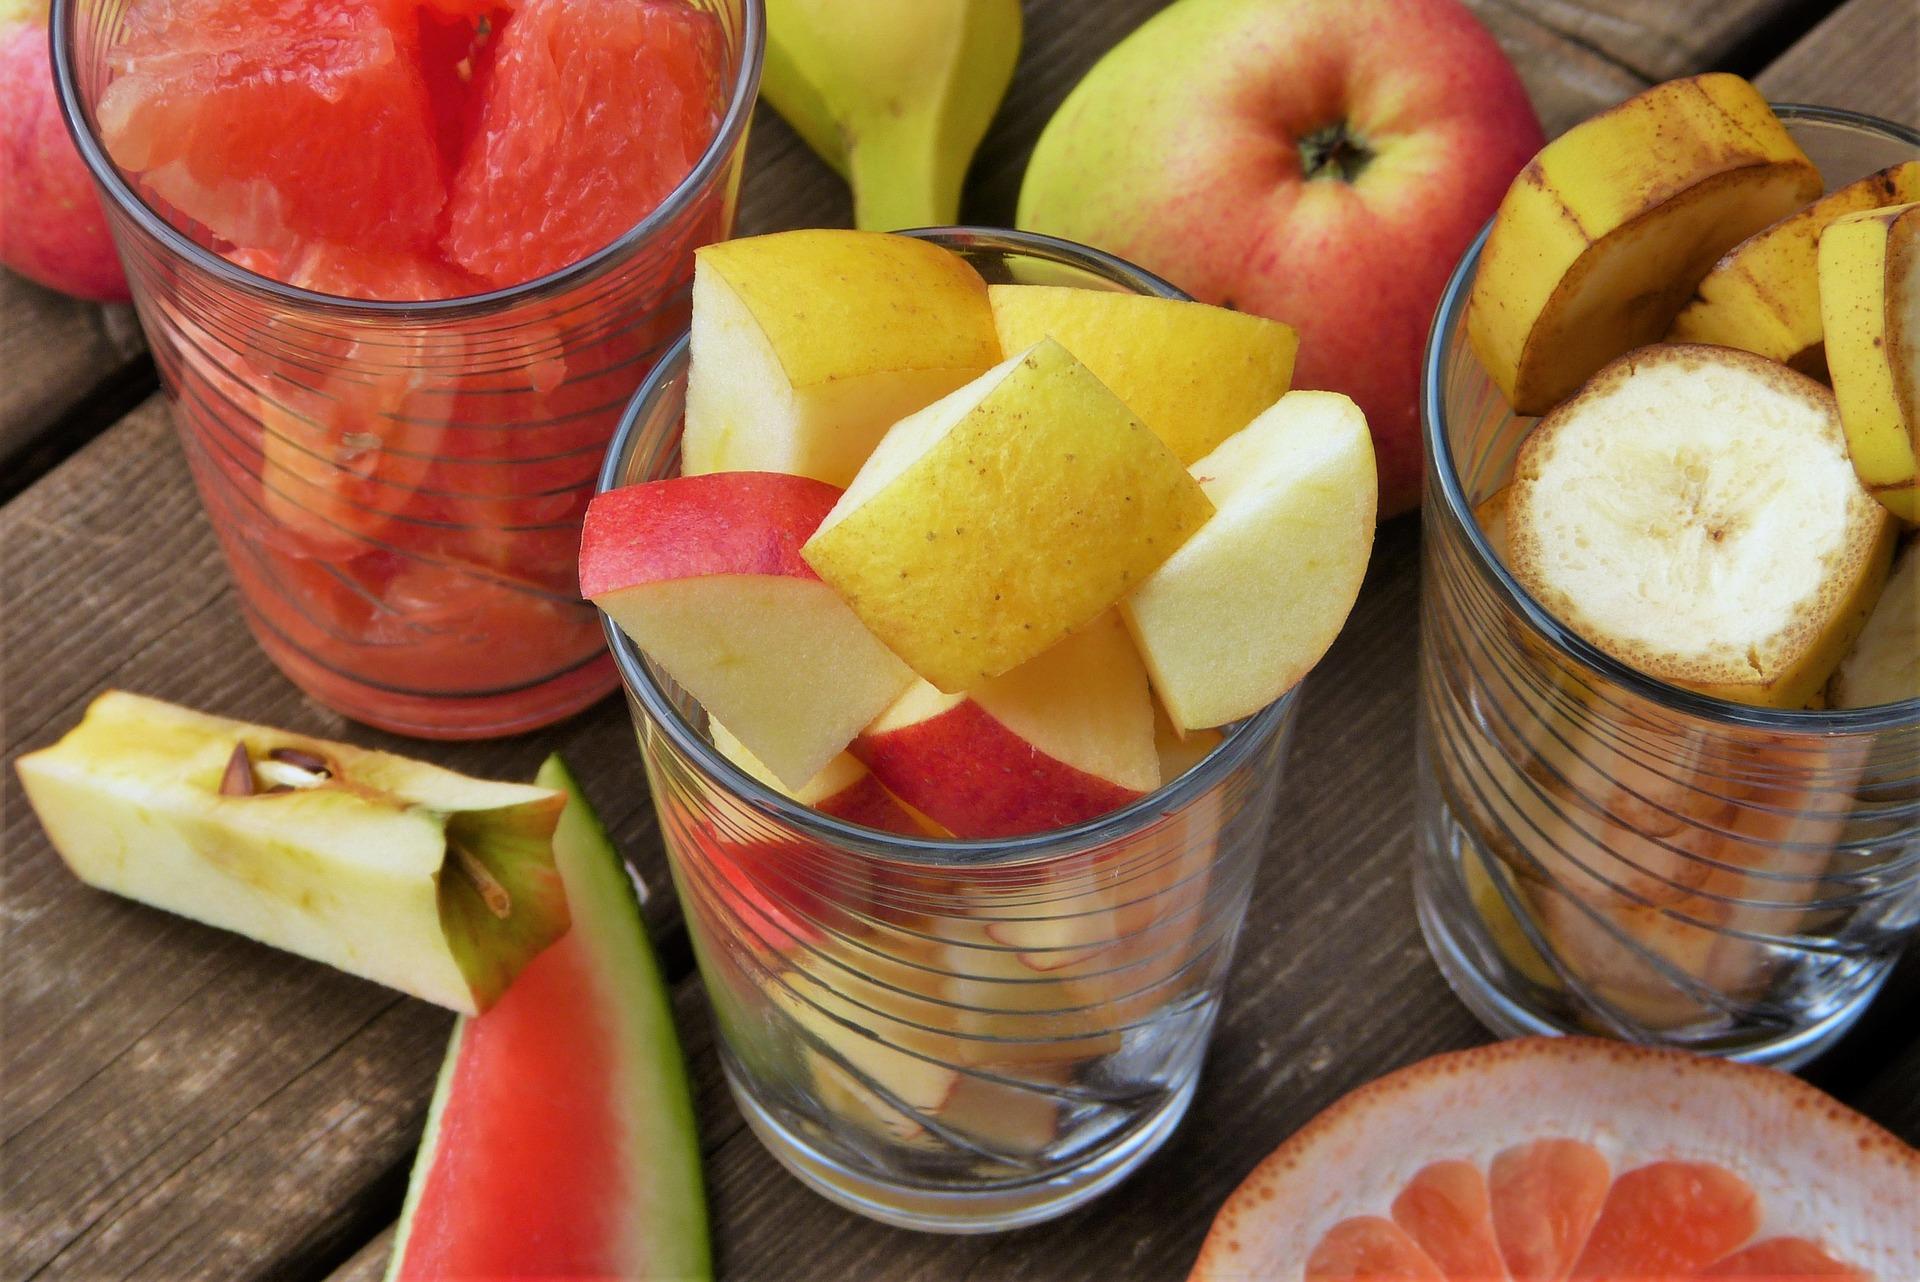 fruit-2665240_1920